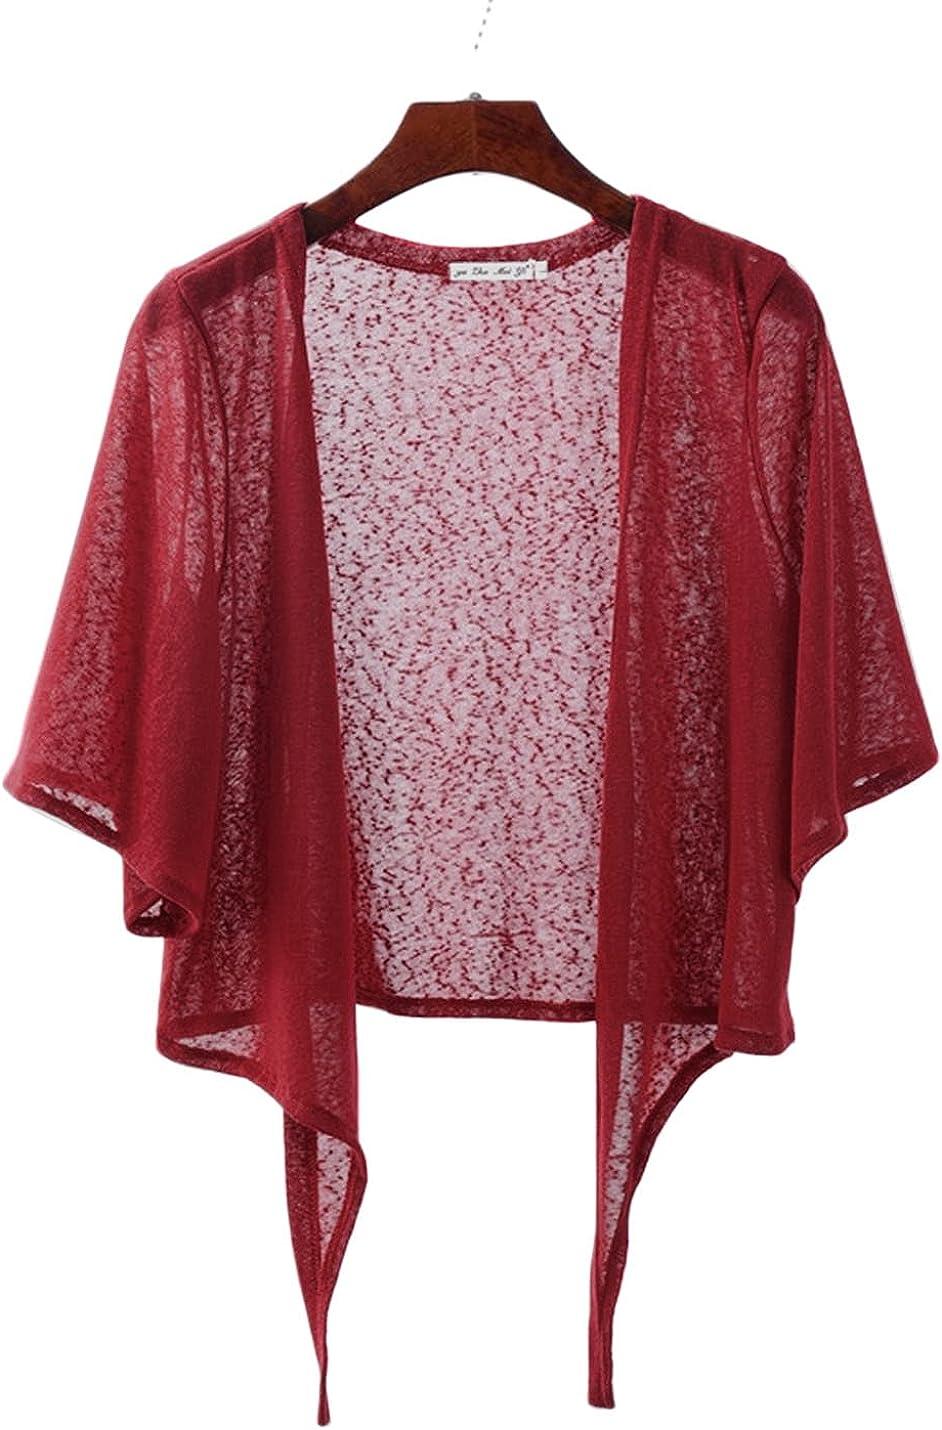 PEHMEA Women's Open Front Cardigan Casual Half Flare Sleeve Tie Front Bolero Shrug(red, x-Large)